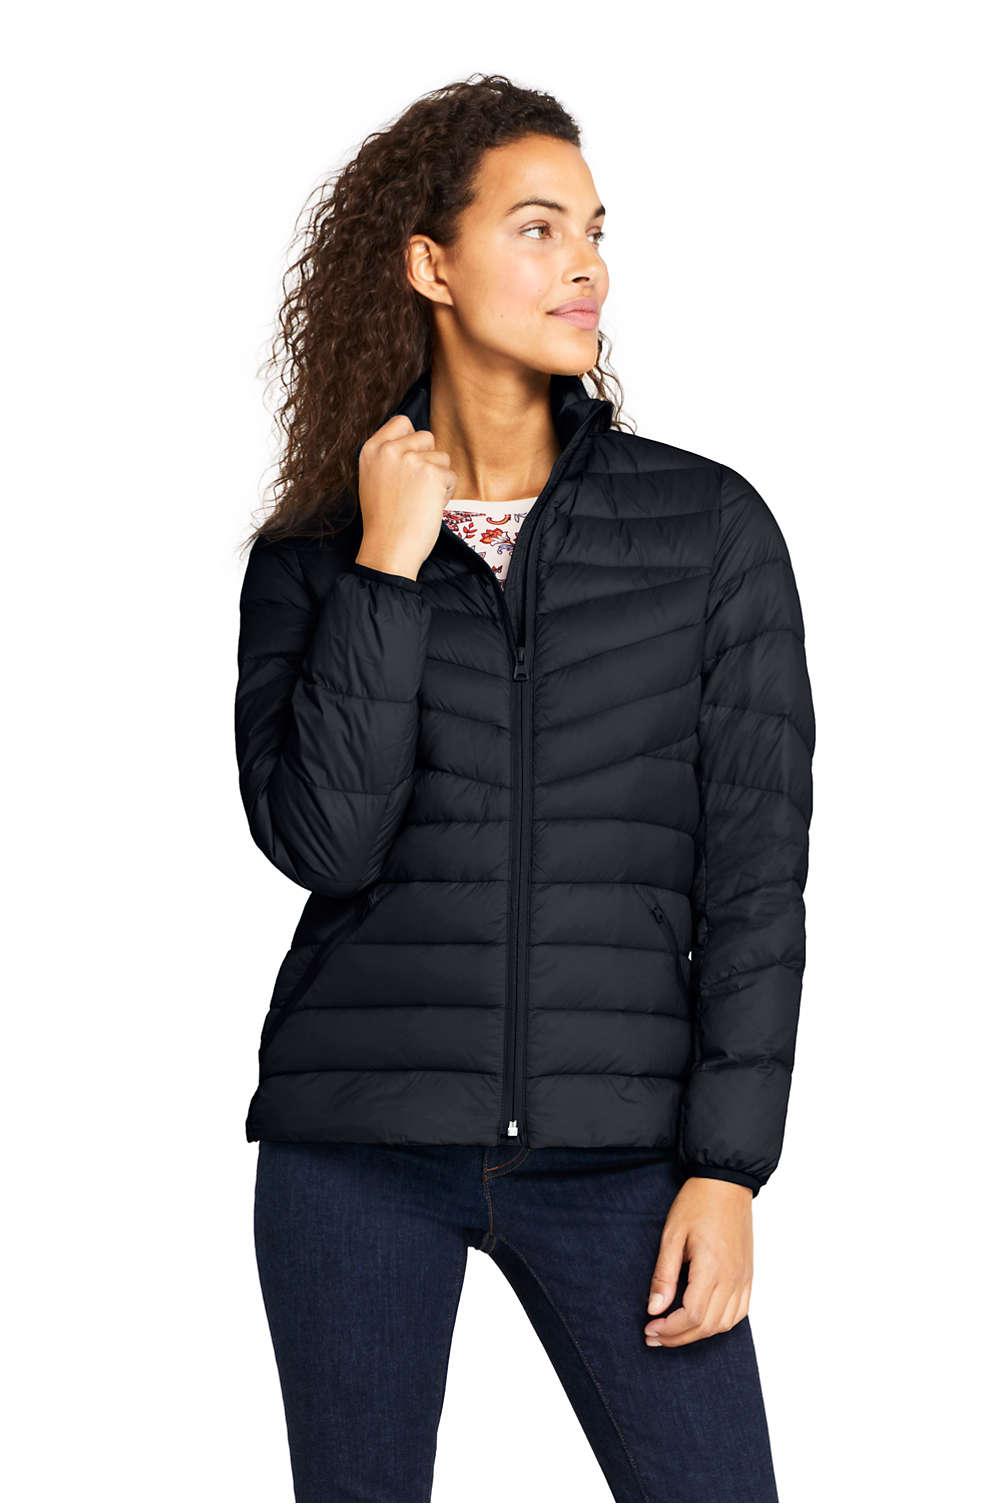 3ece12af544 Women's Ultralight Packable Down Jacket from Lands' End